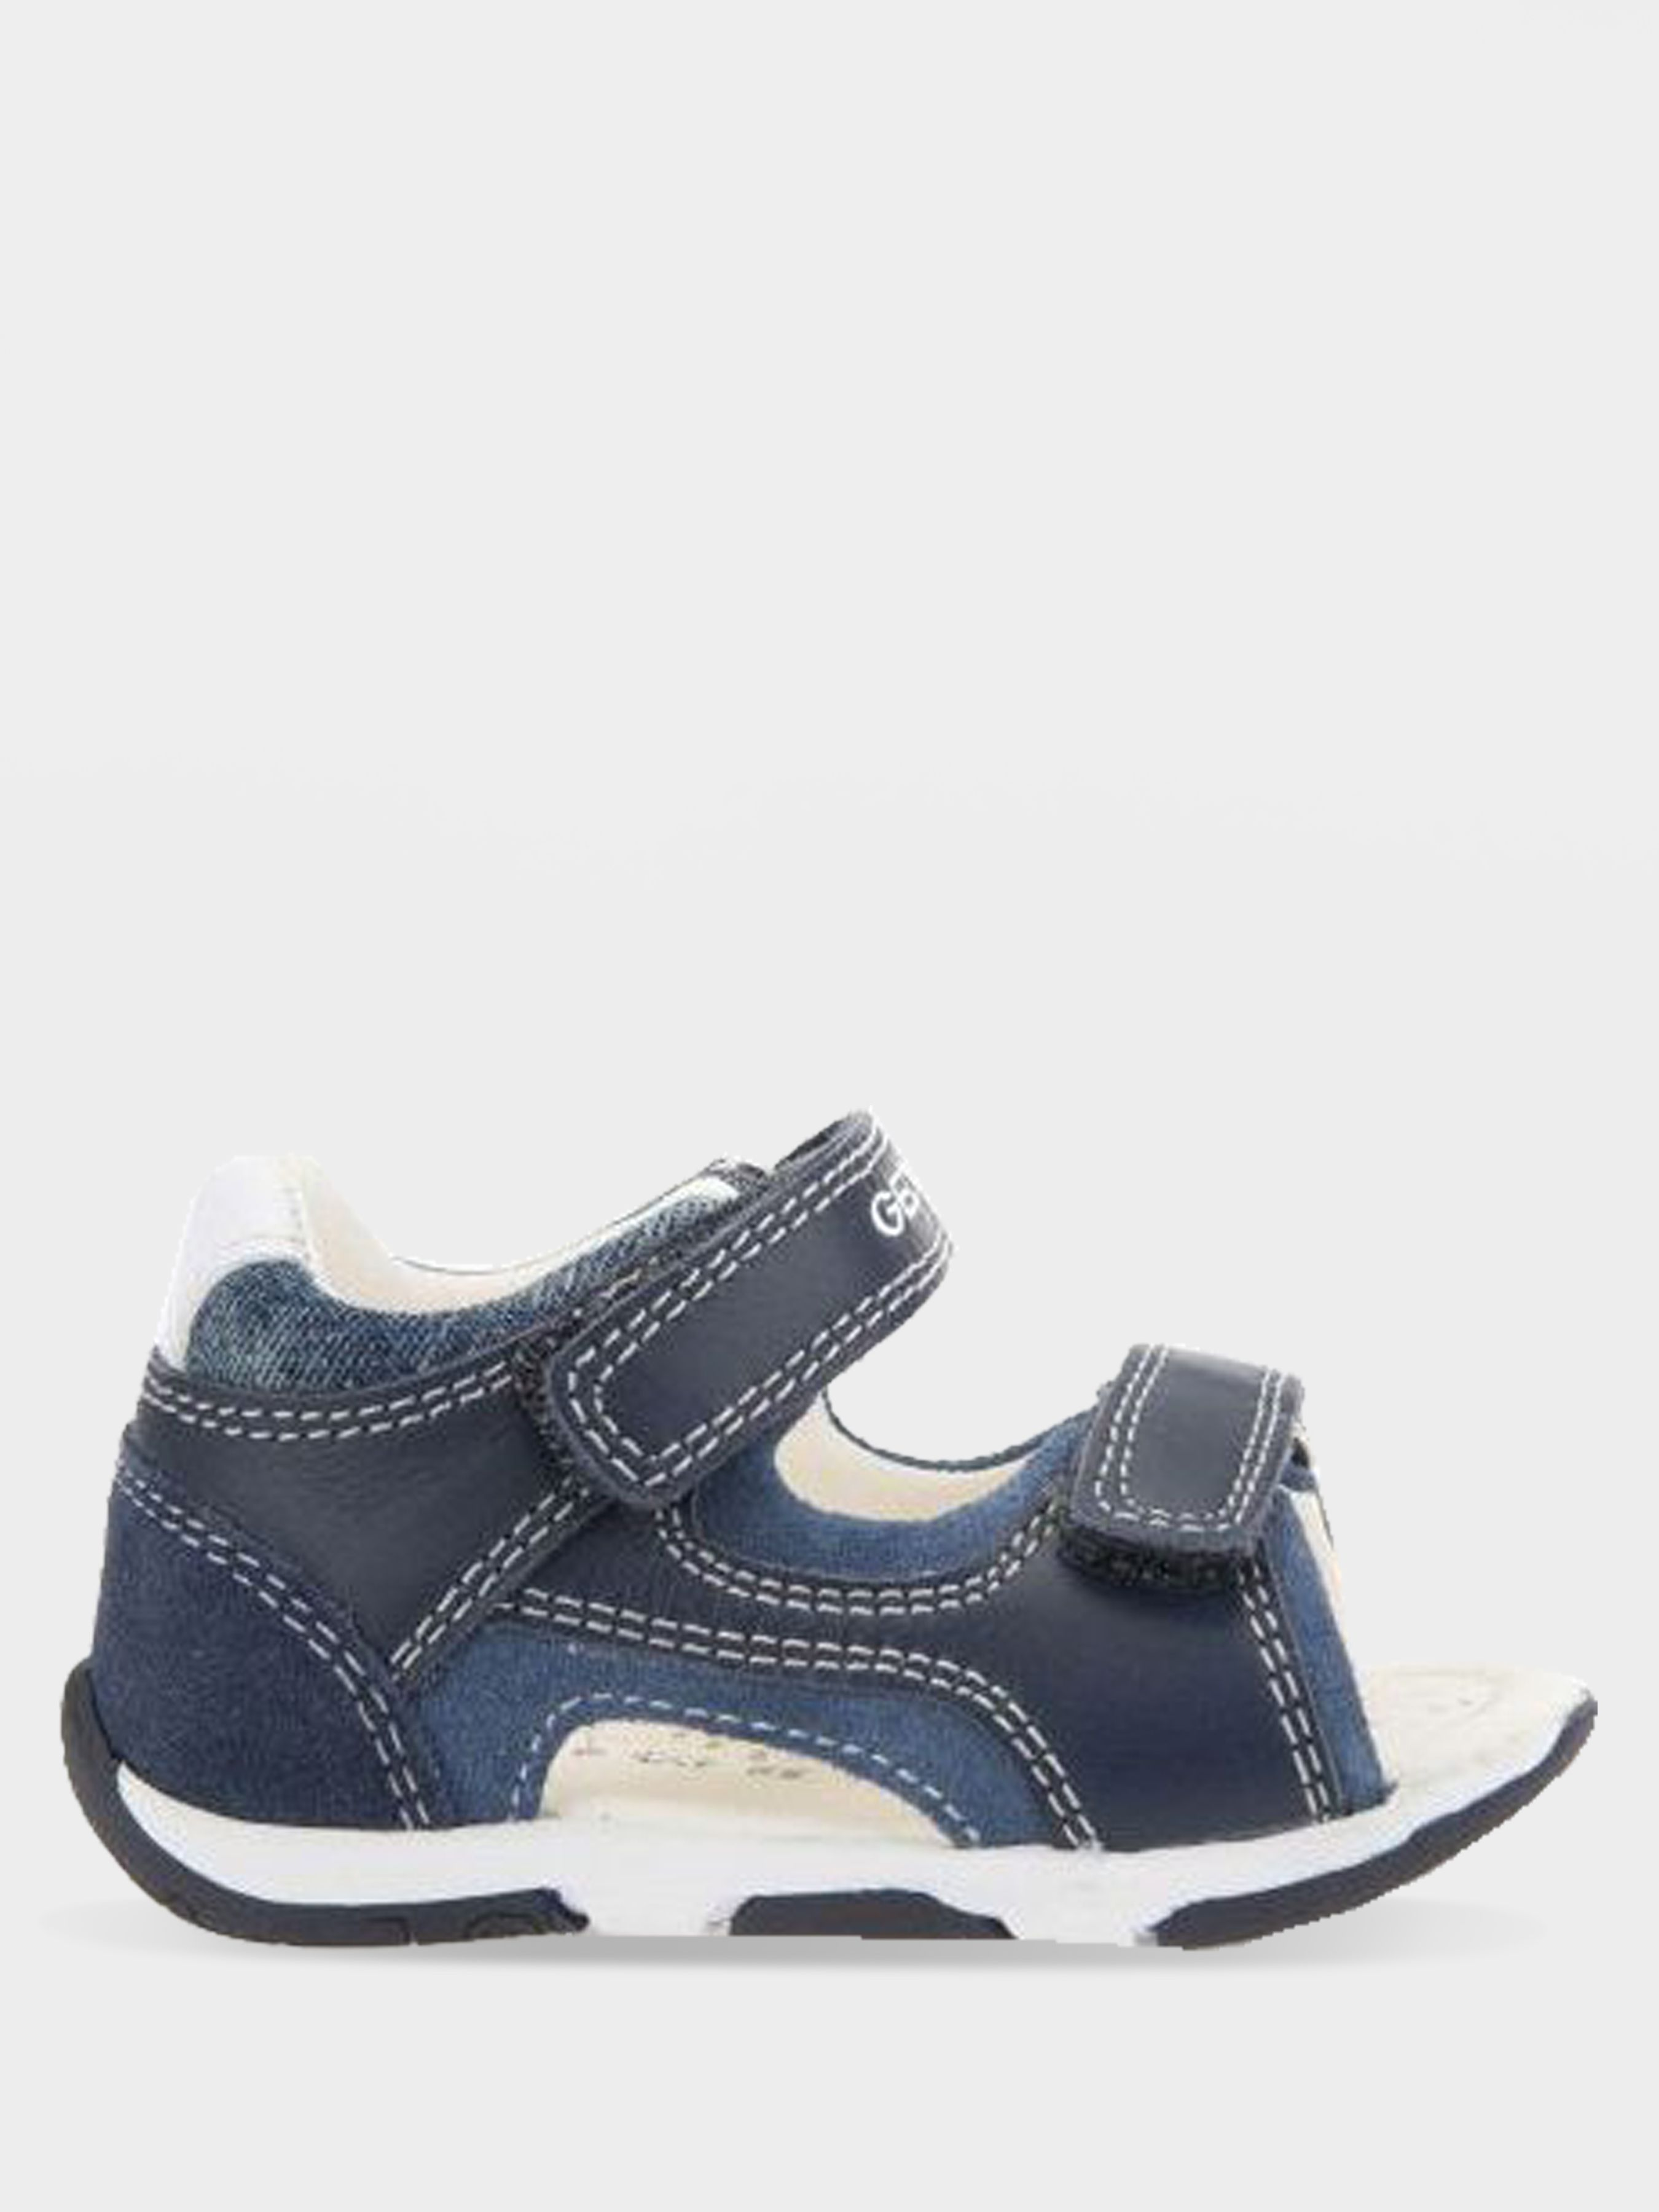 Сандалии для детей Geox B S.TAPUZ B. C - NAPPA+SCAM. XK5738 размерная сетка обуви, 2017